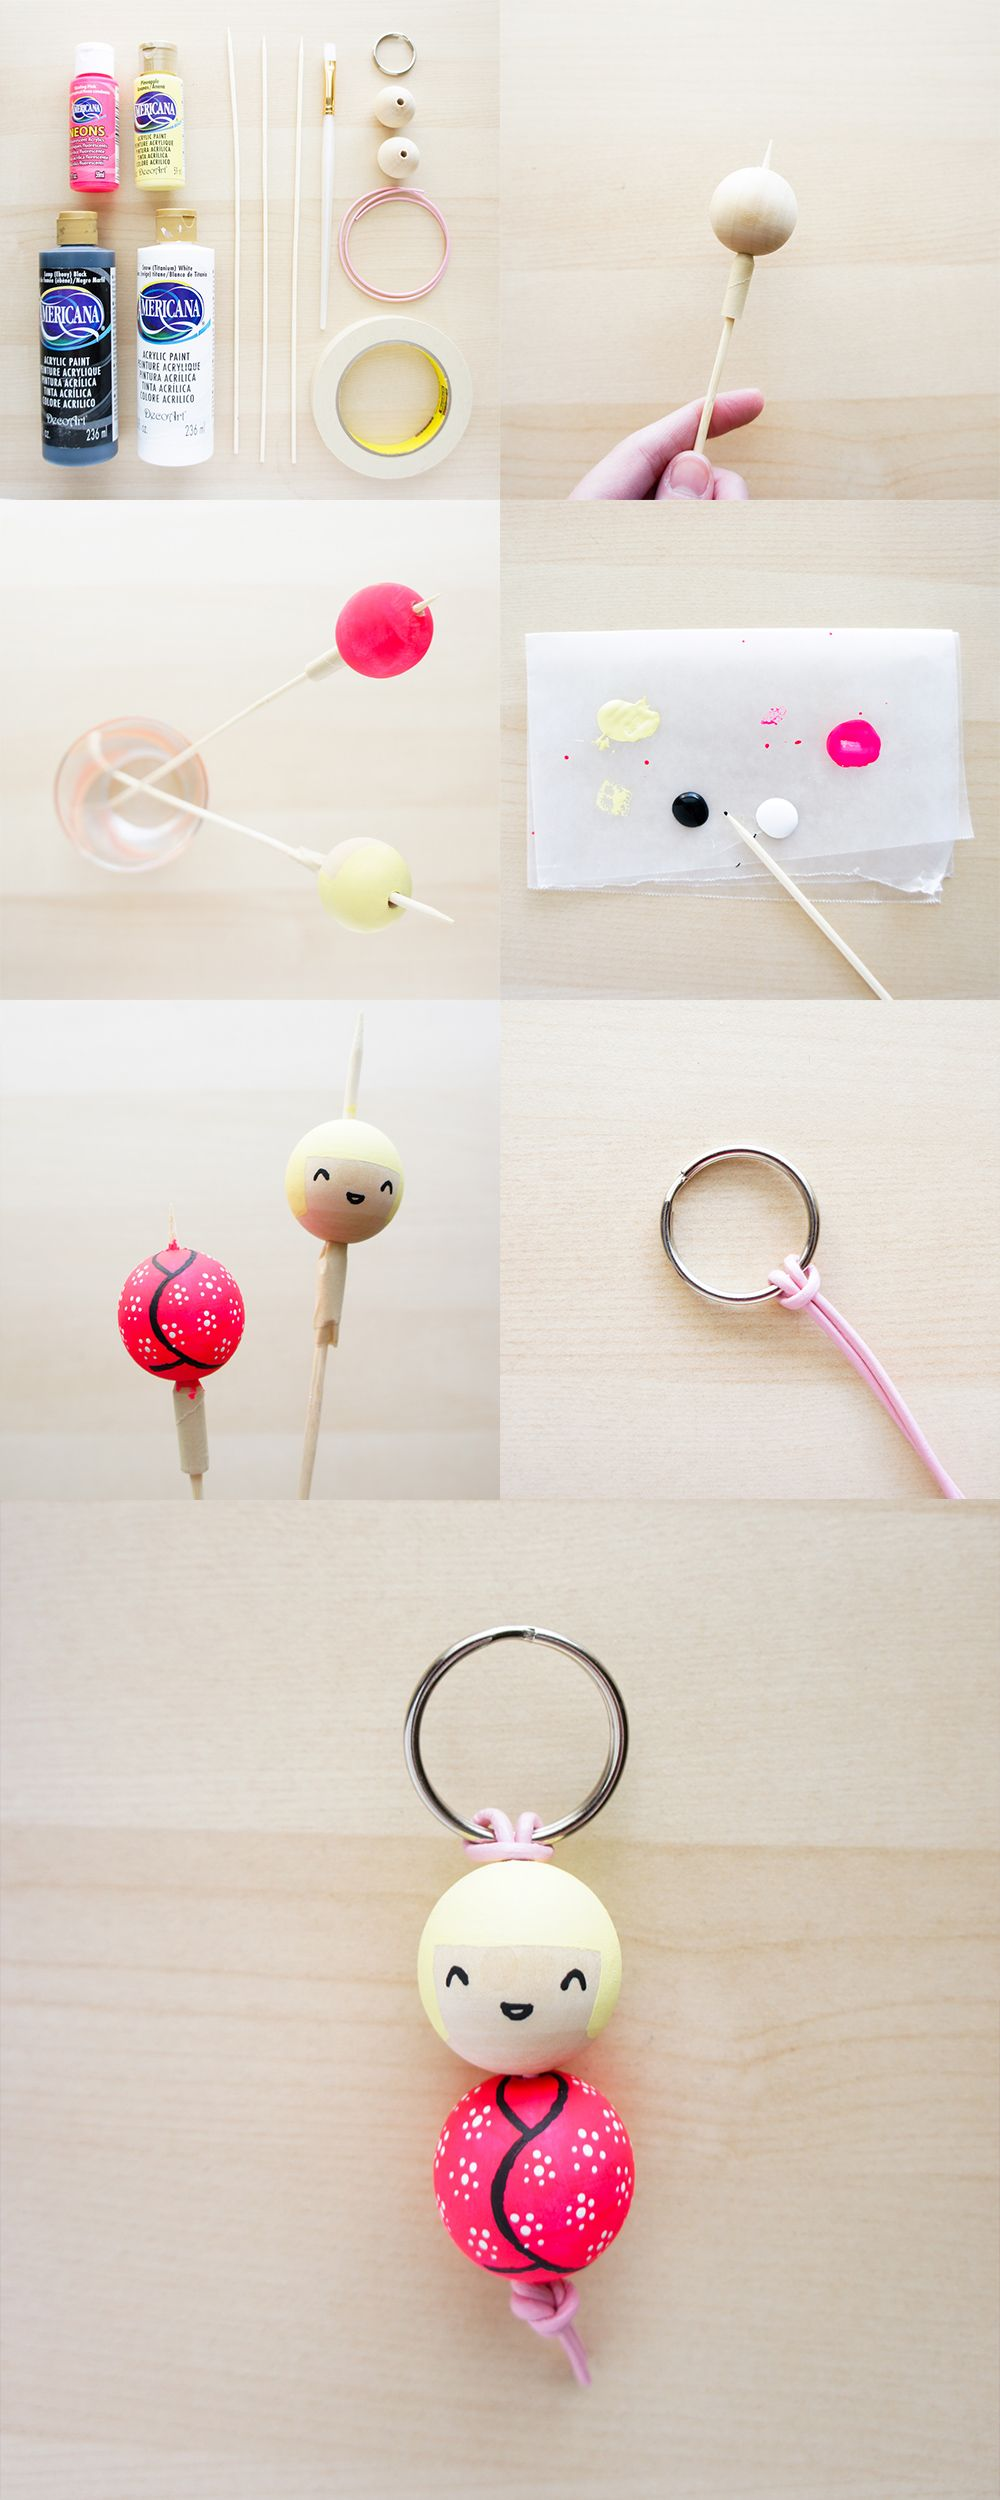 Dy Painted Bead Key Chain Via The Pink Samurai Craft Diy